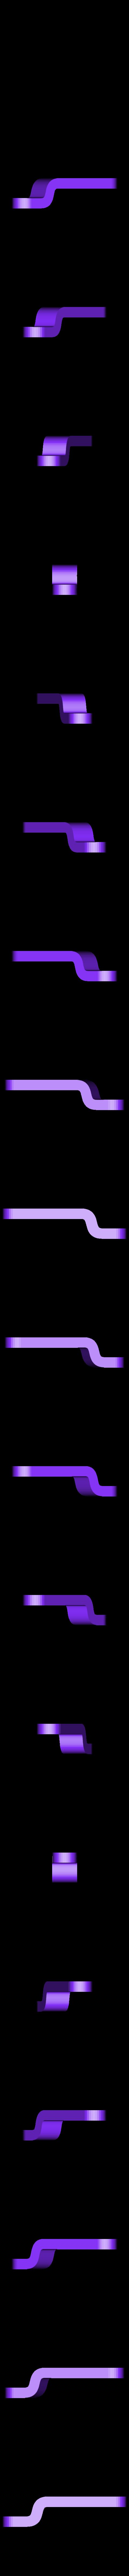 involute_blower_crank.stl Download free STL file Involute Blower • 3D print design, Azagal